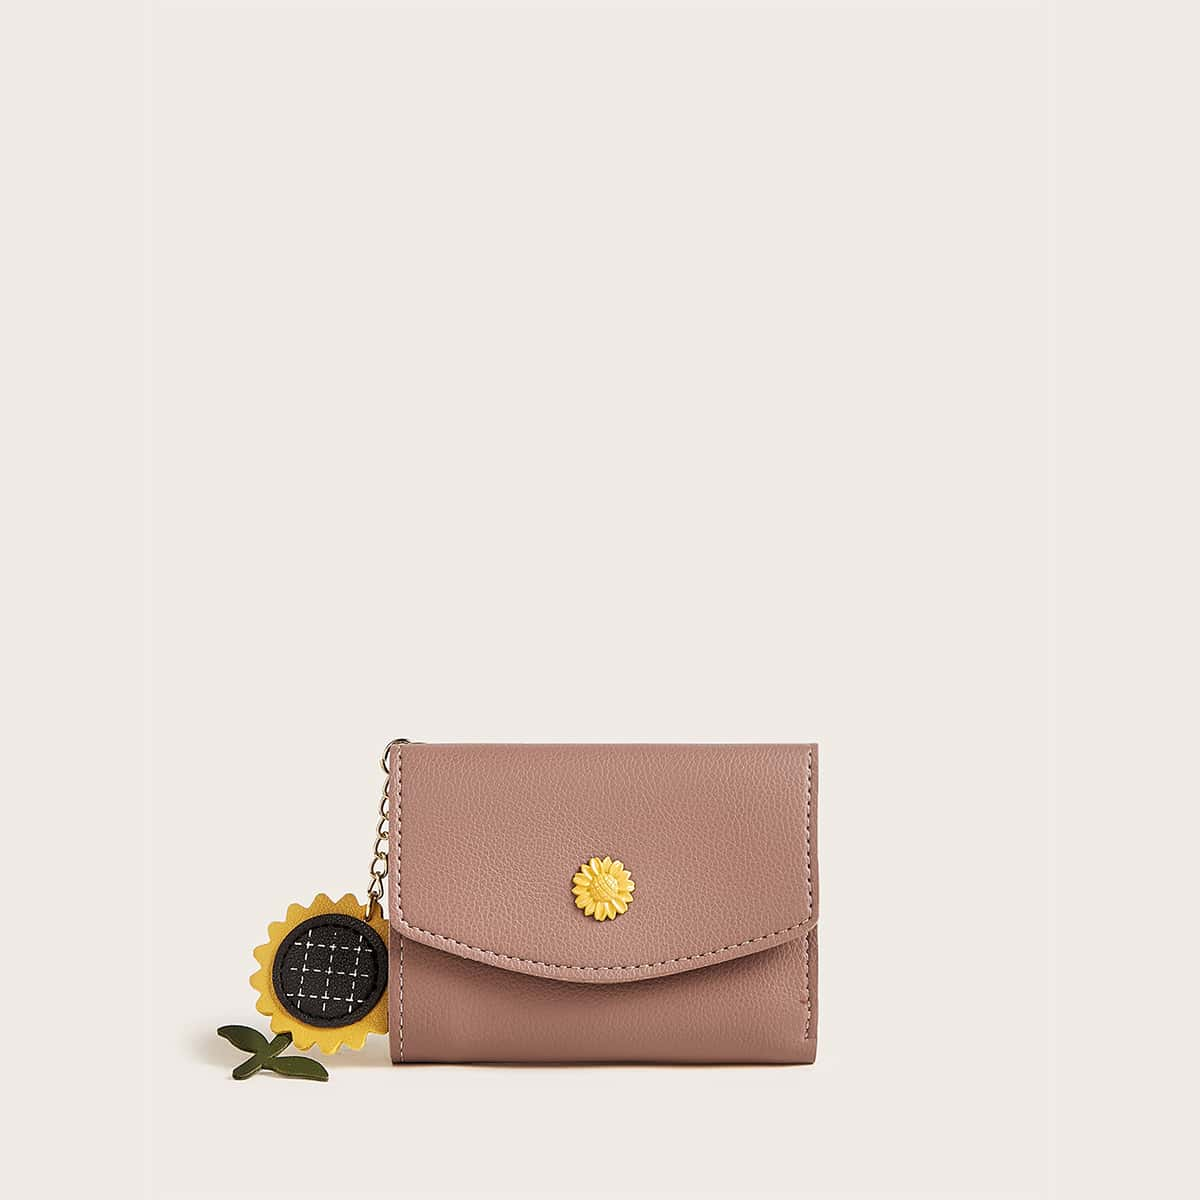 Sunflower Charm Purse